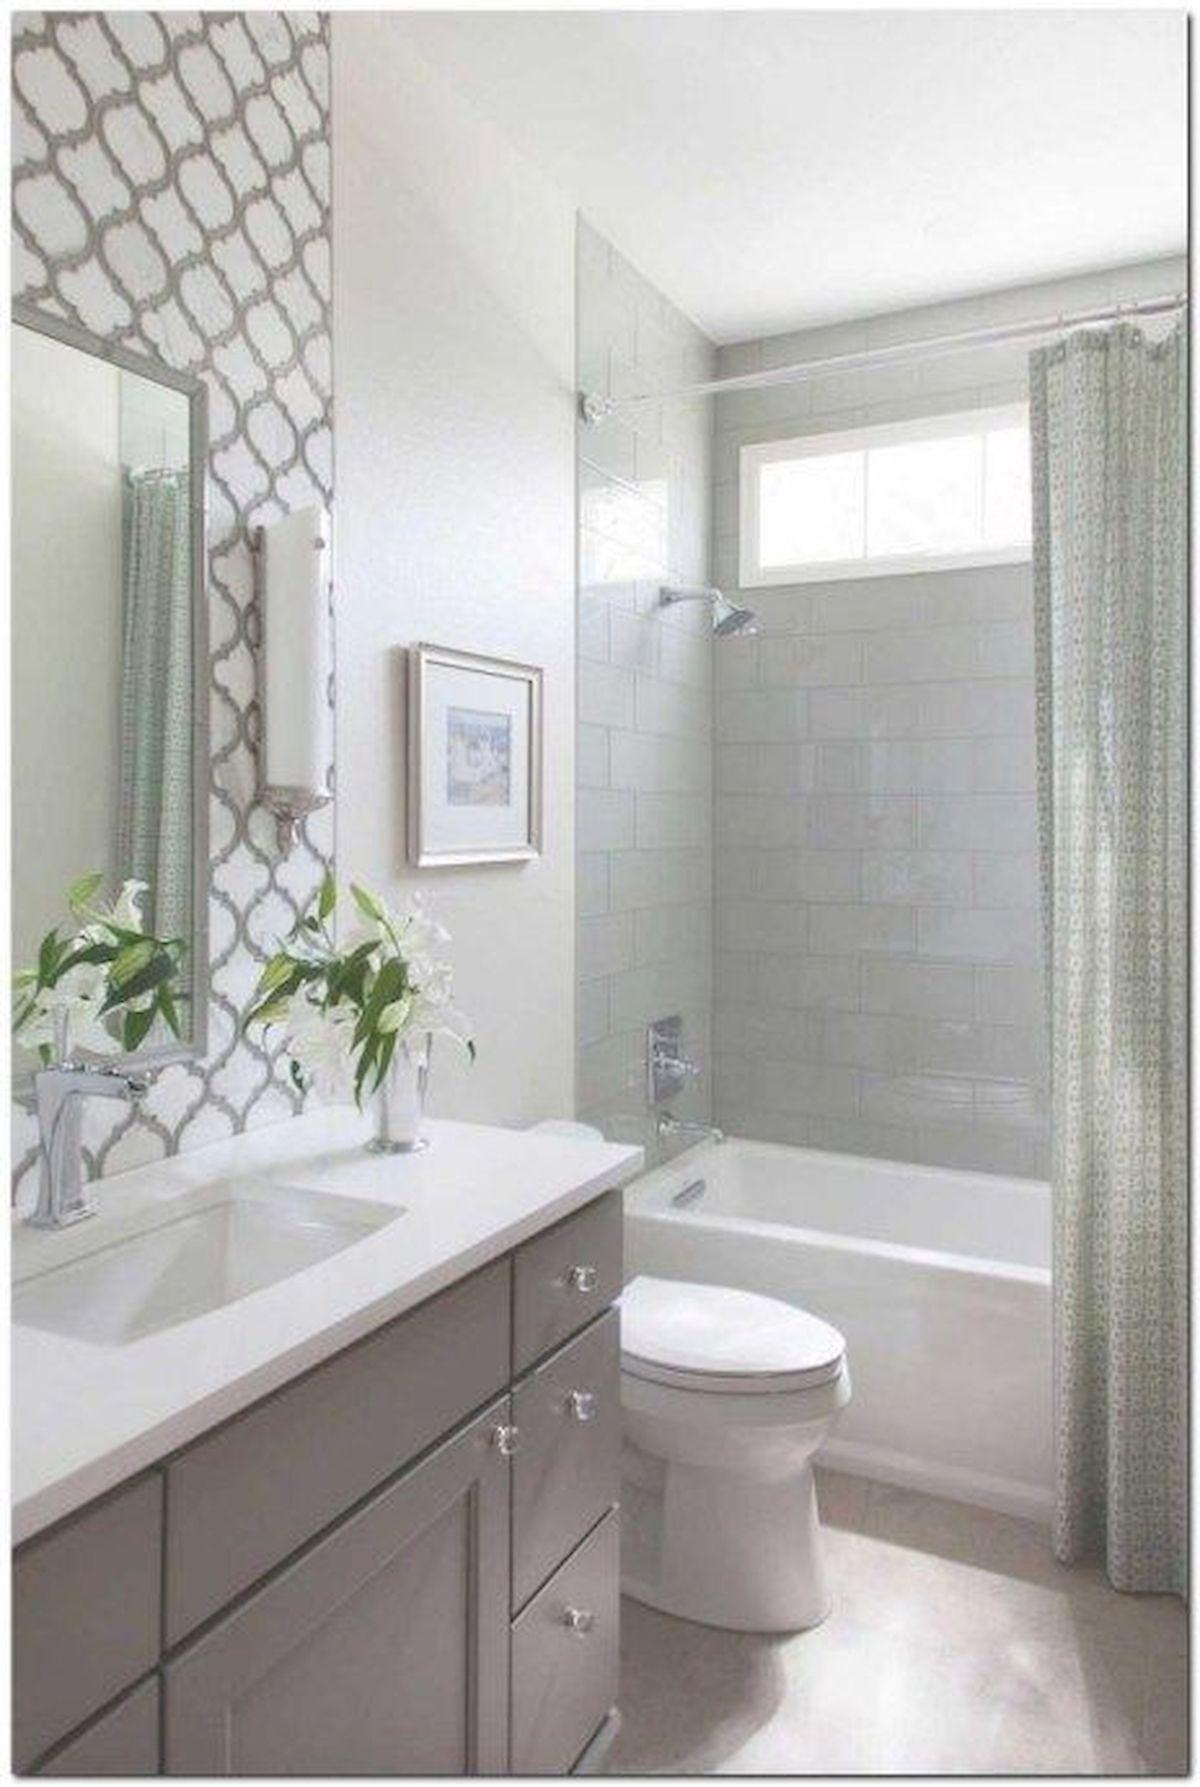 60 Elegant Small Master Bathroom Remodel Ideas 30 Bathroom Tub